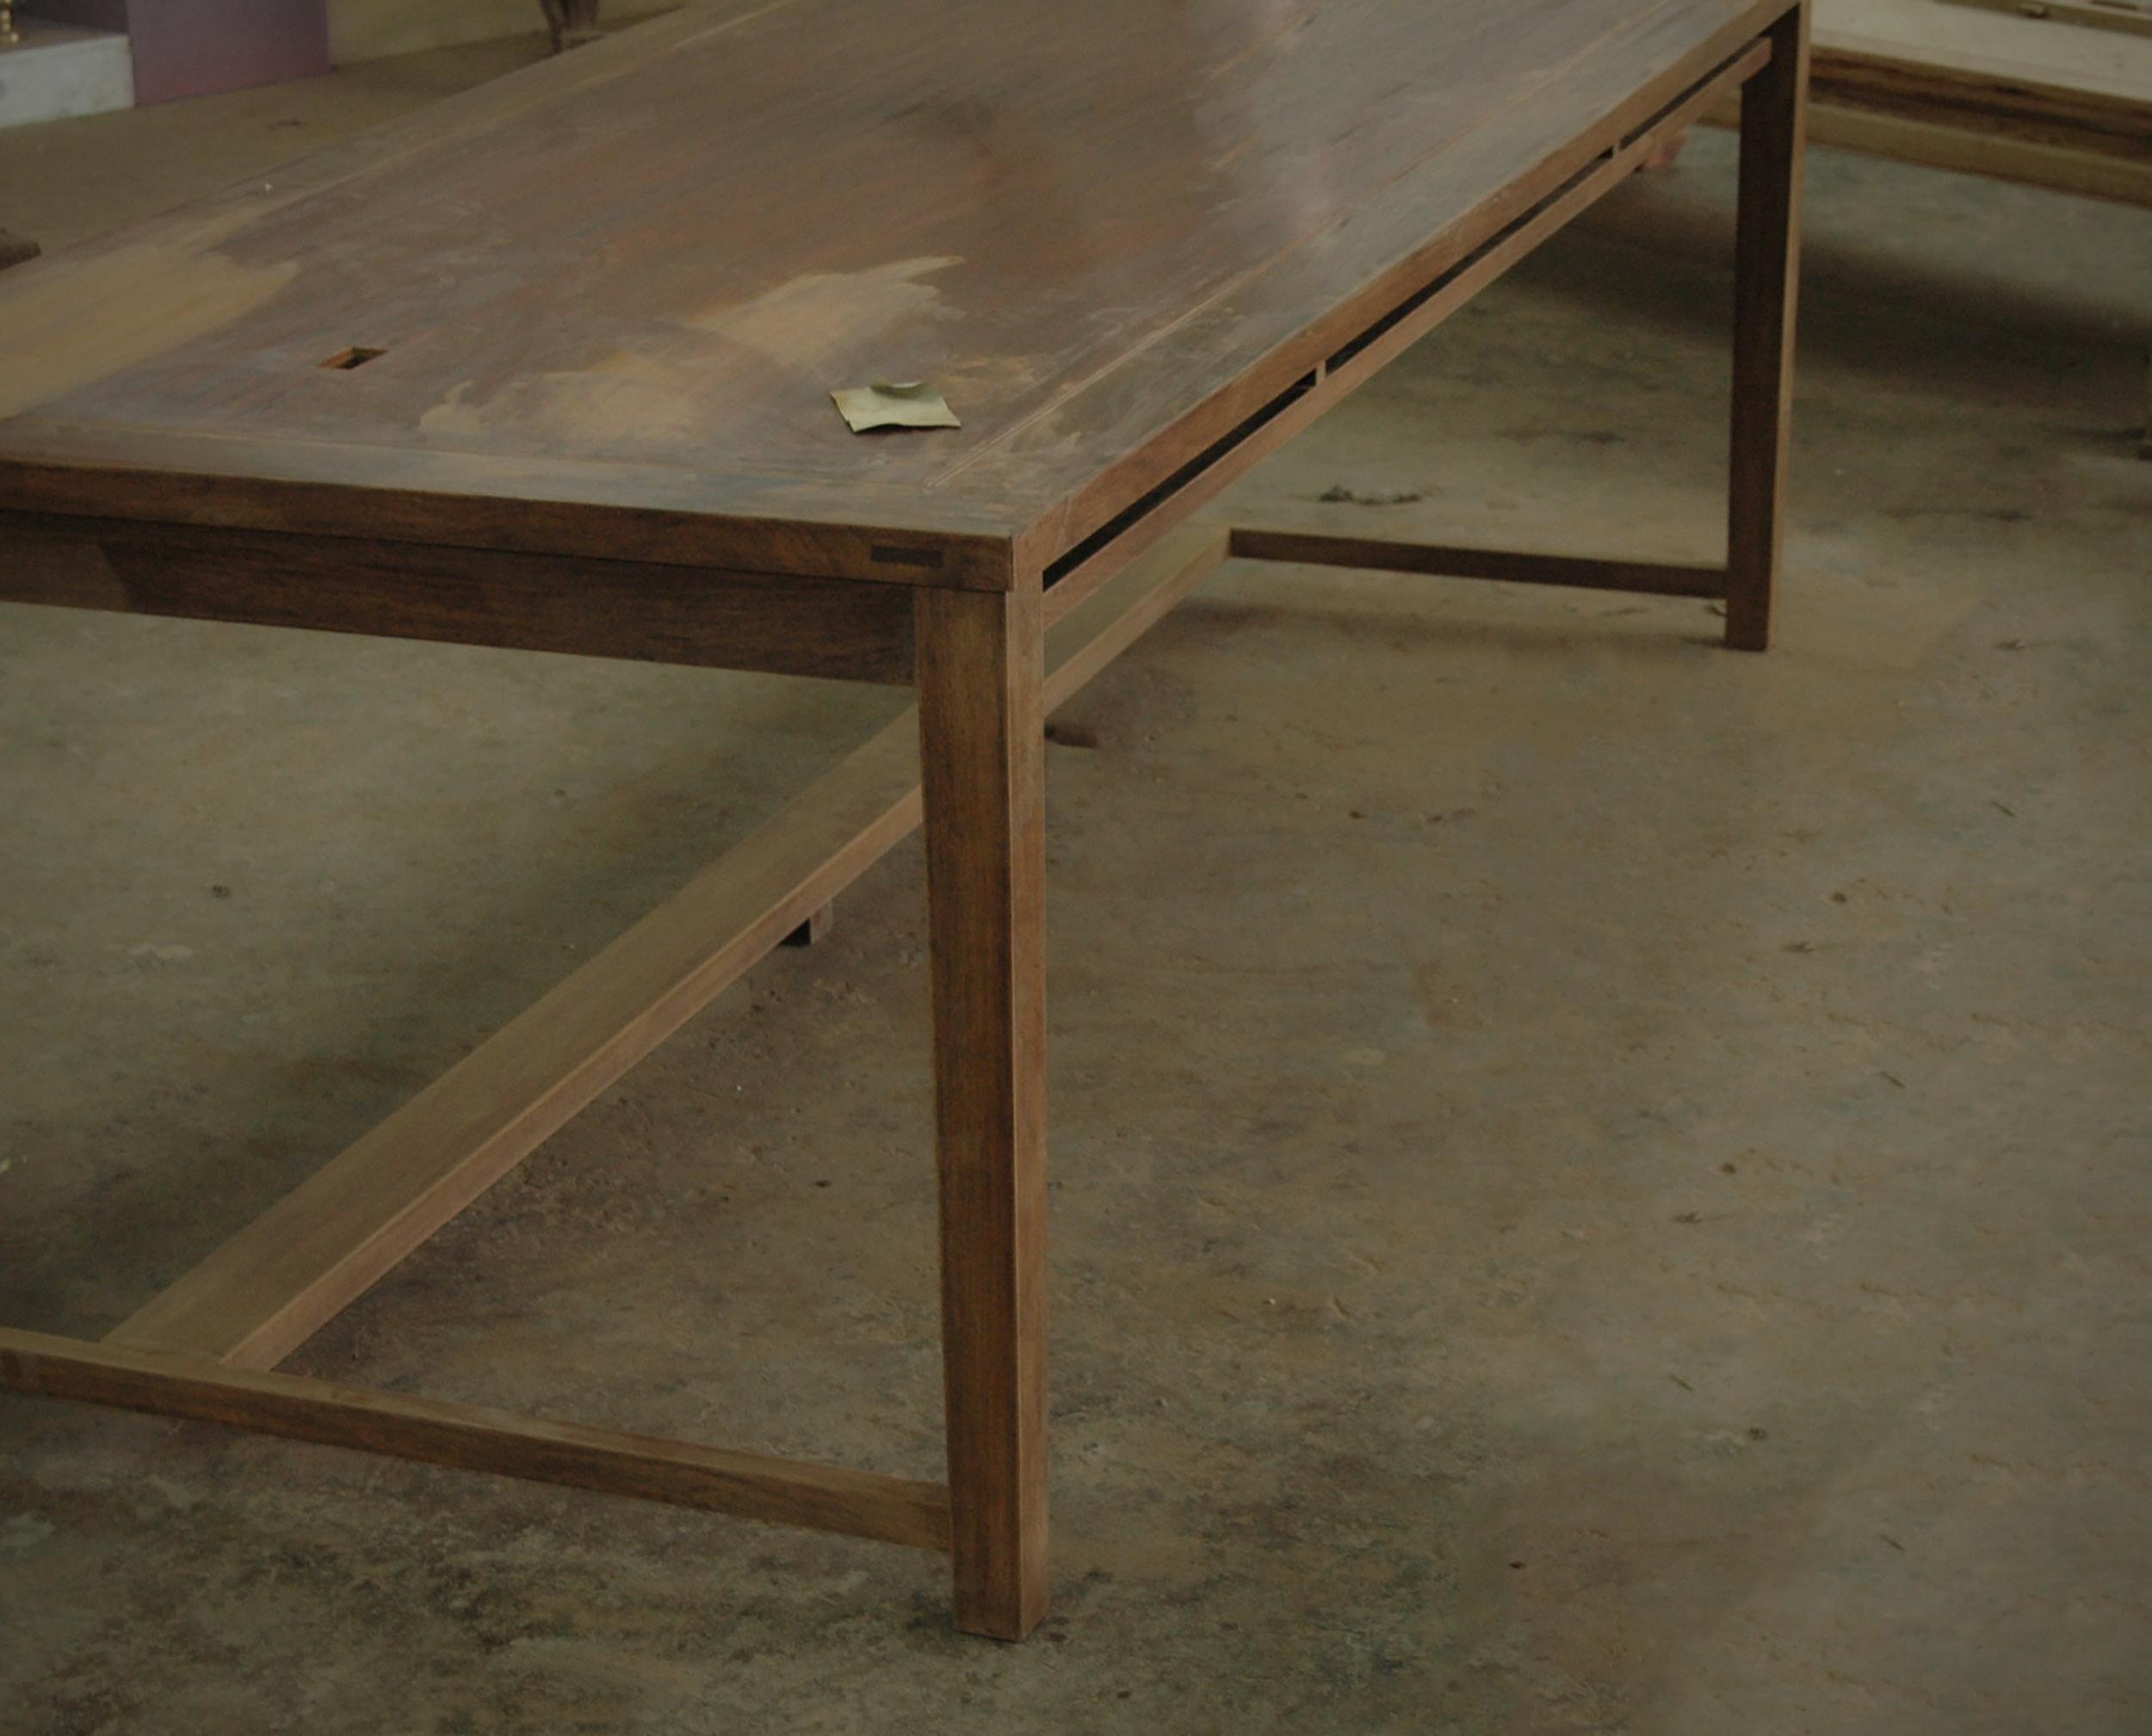 ....bespoke furniture : artisan crafting photos..特别定制家具 : 公丈制作照片....